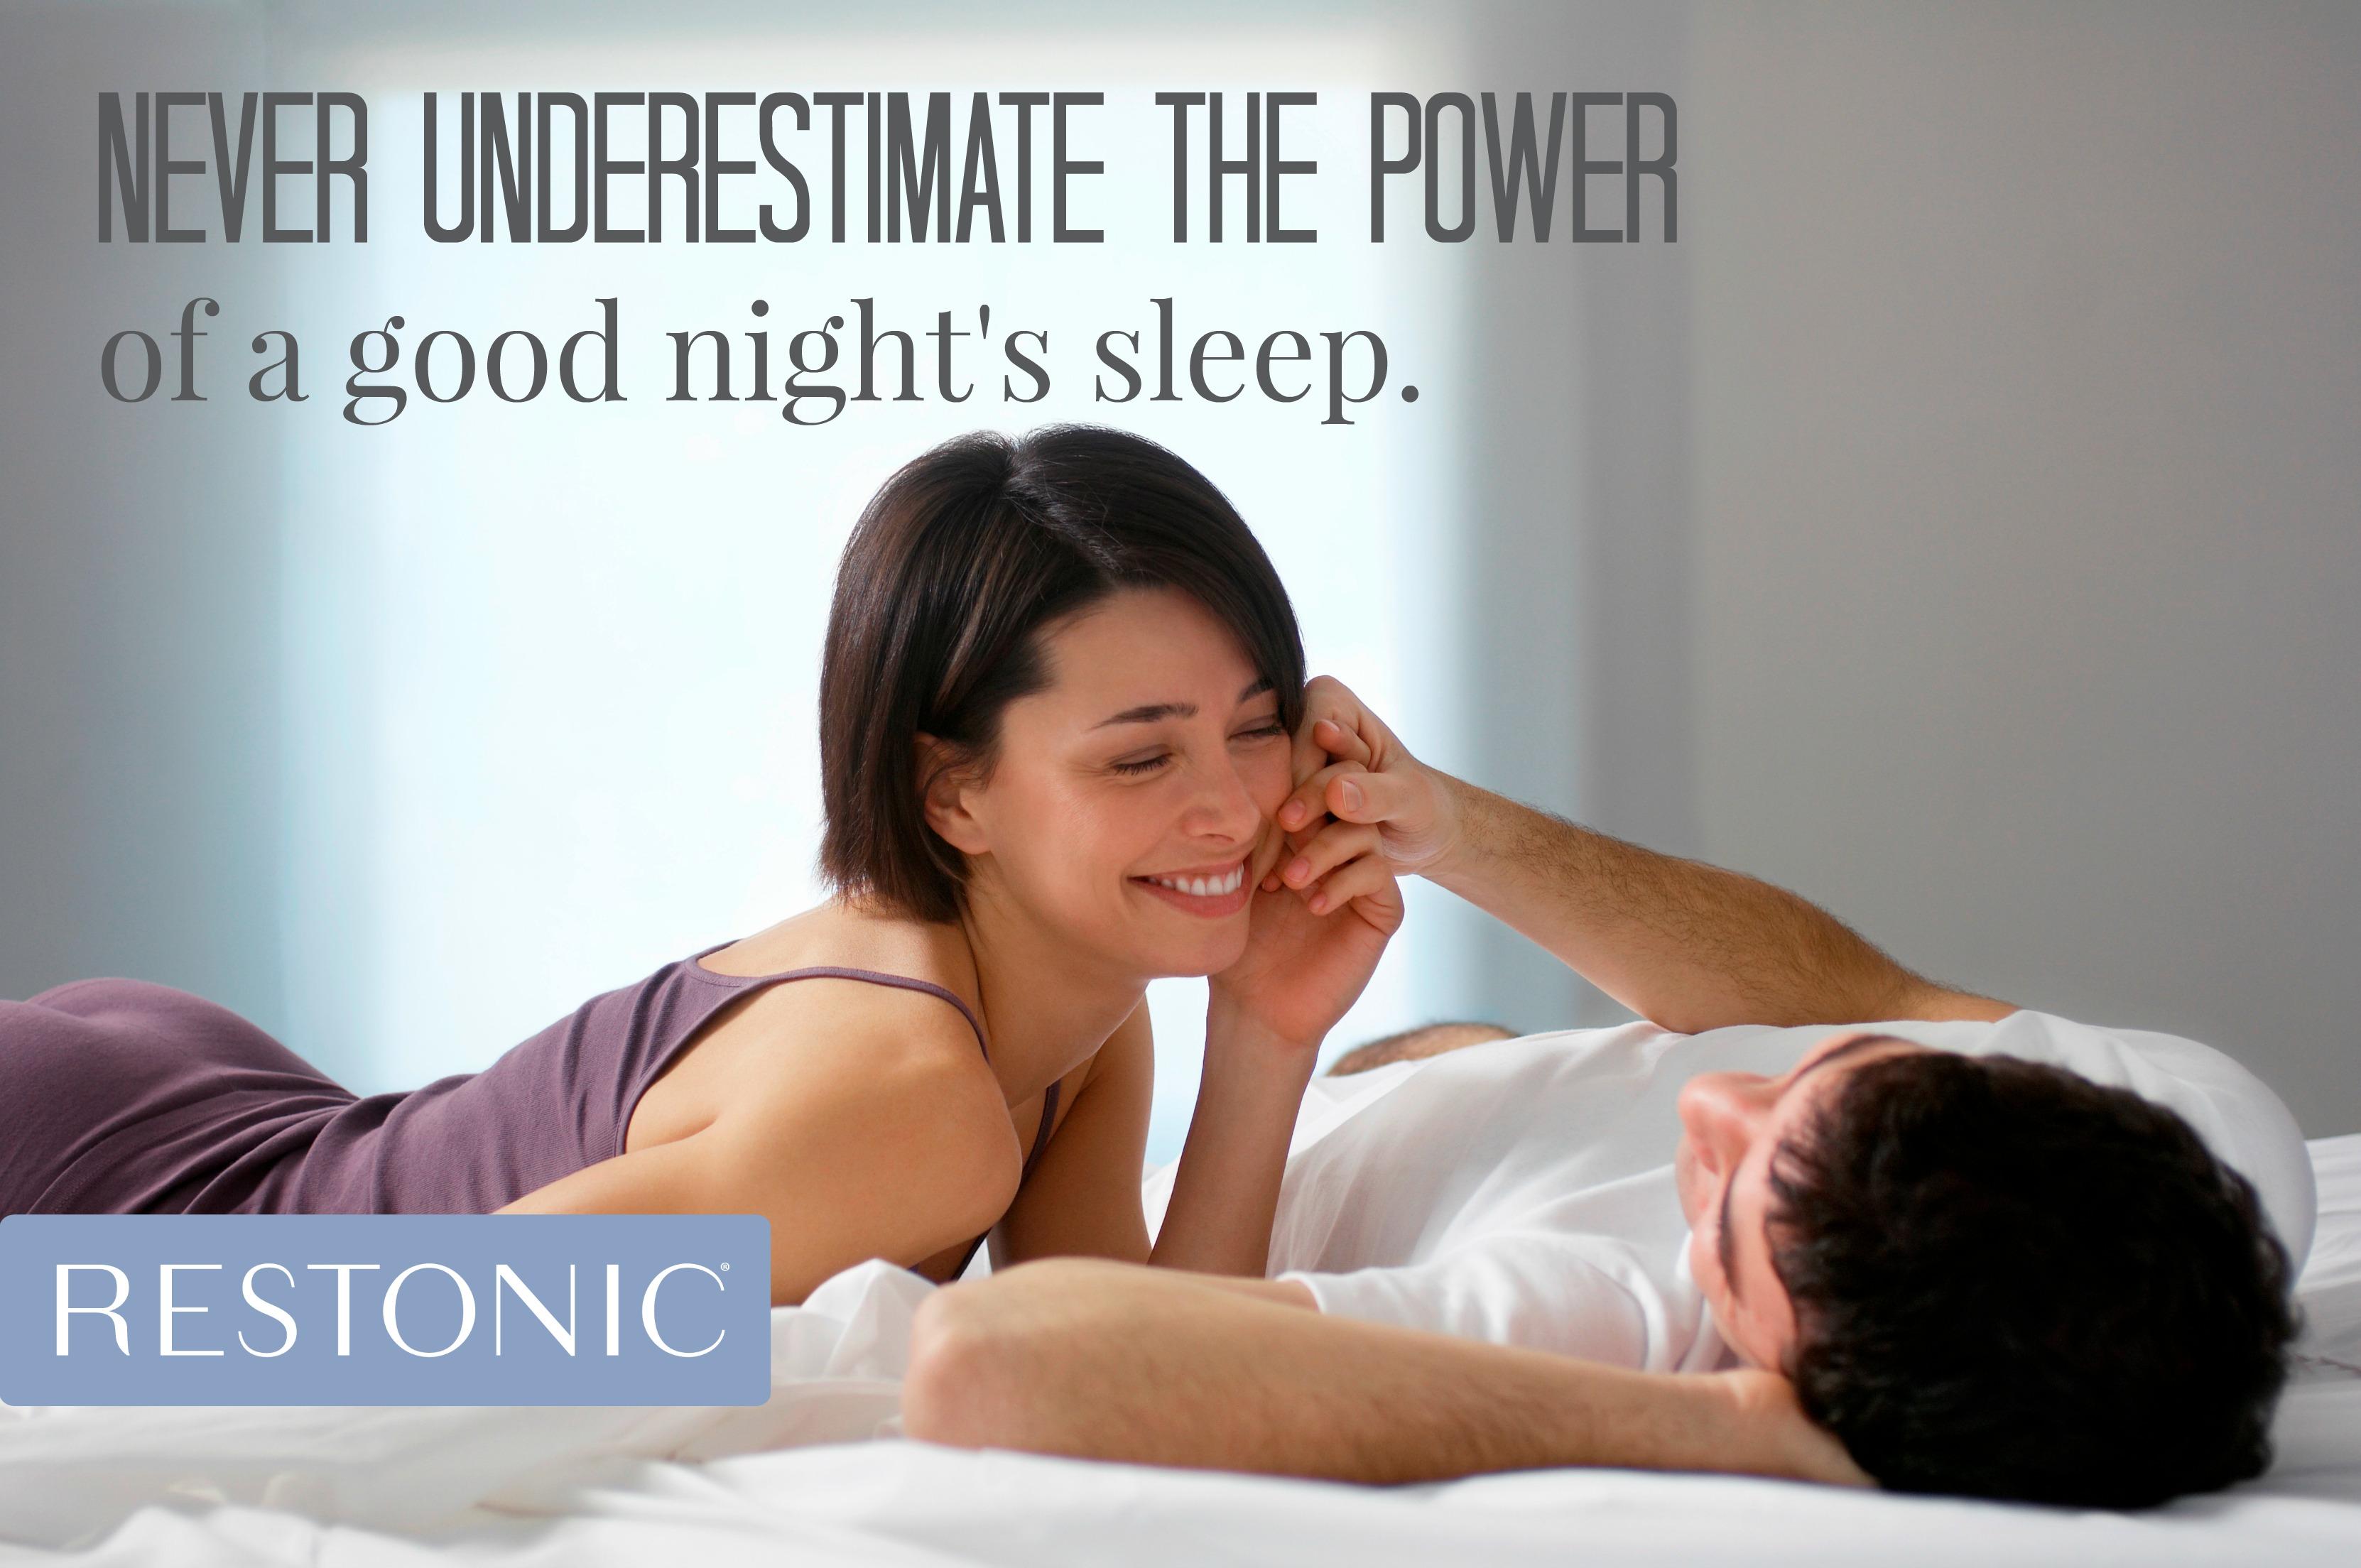 product orthozone set base bedman restonic pillow the online mattress reviews top